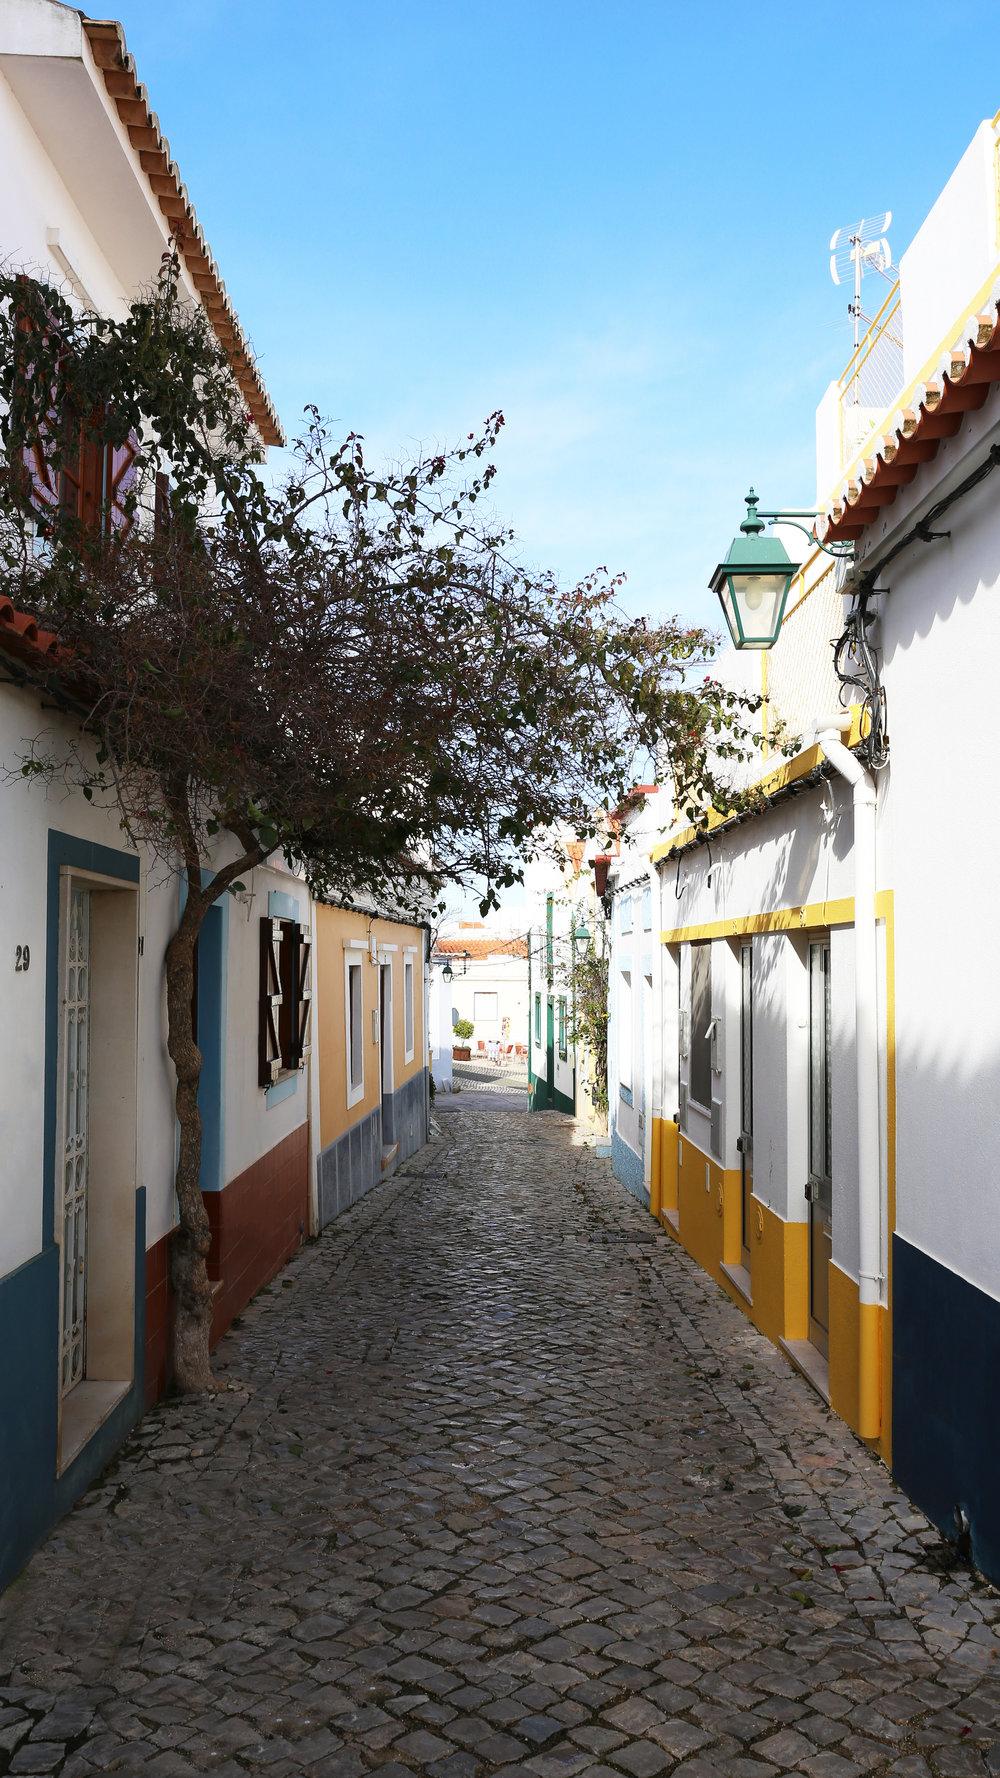 Portugal Road Trip - From Algarve's coastal towns to Lisbon's coziest cafésRead more ..